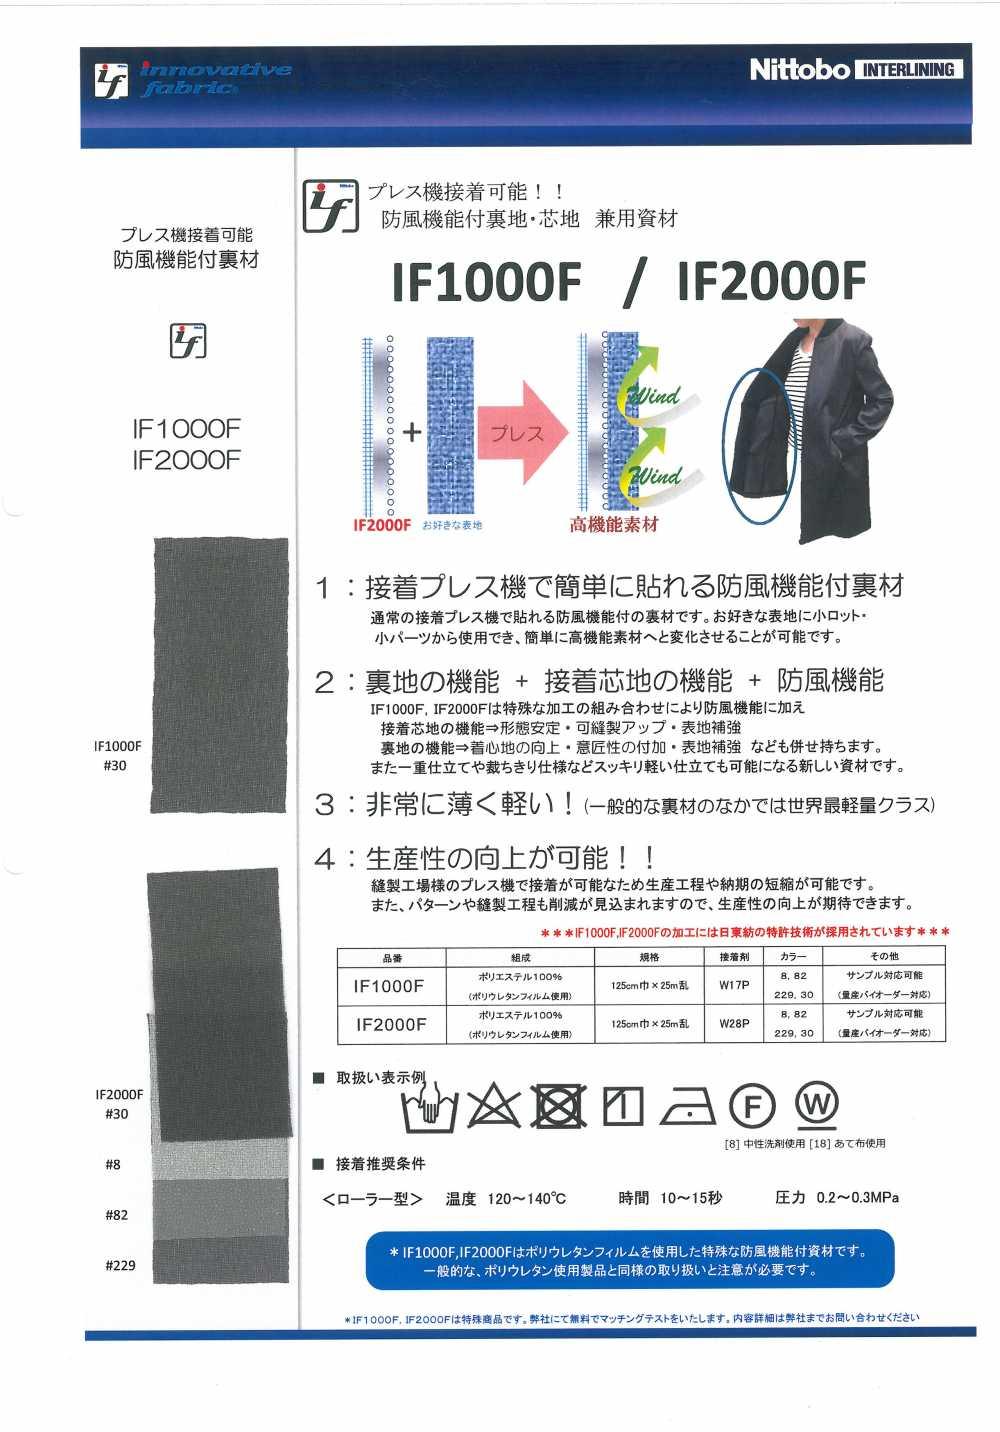 IF1000F 防風機能付裏地・芯地 兼用資材 日東紡インターライニング/オークラ商事 - ApparelX アパレル資材卸通販